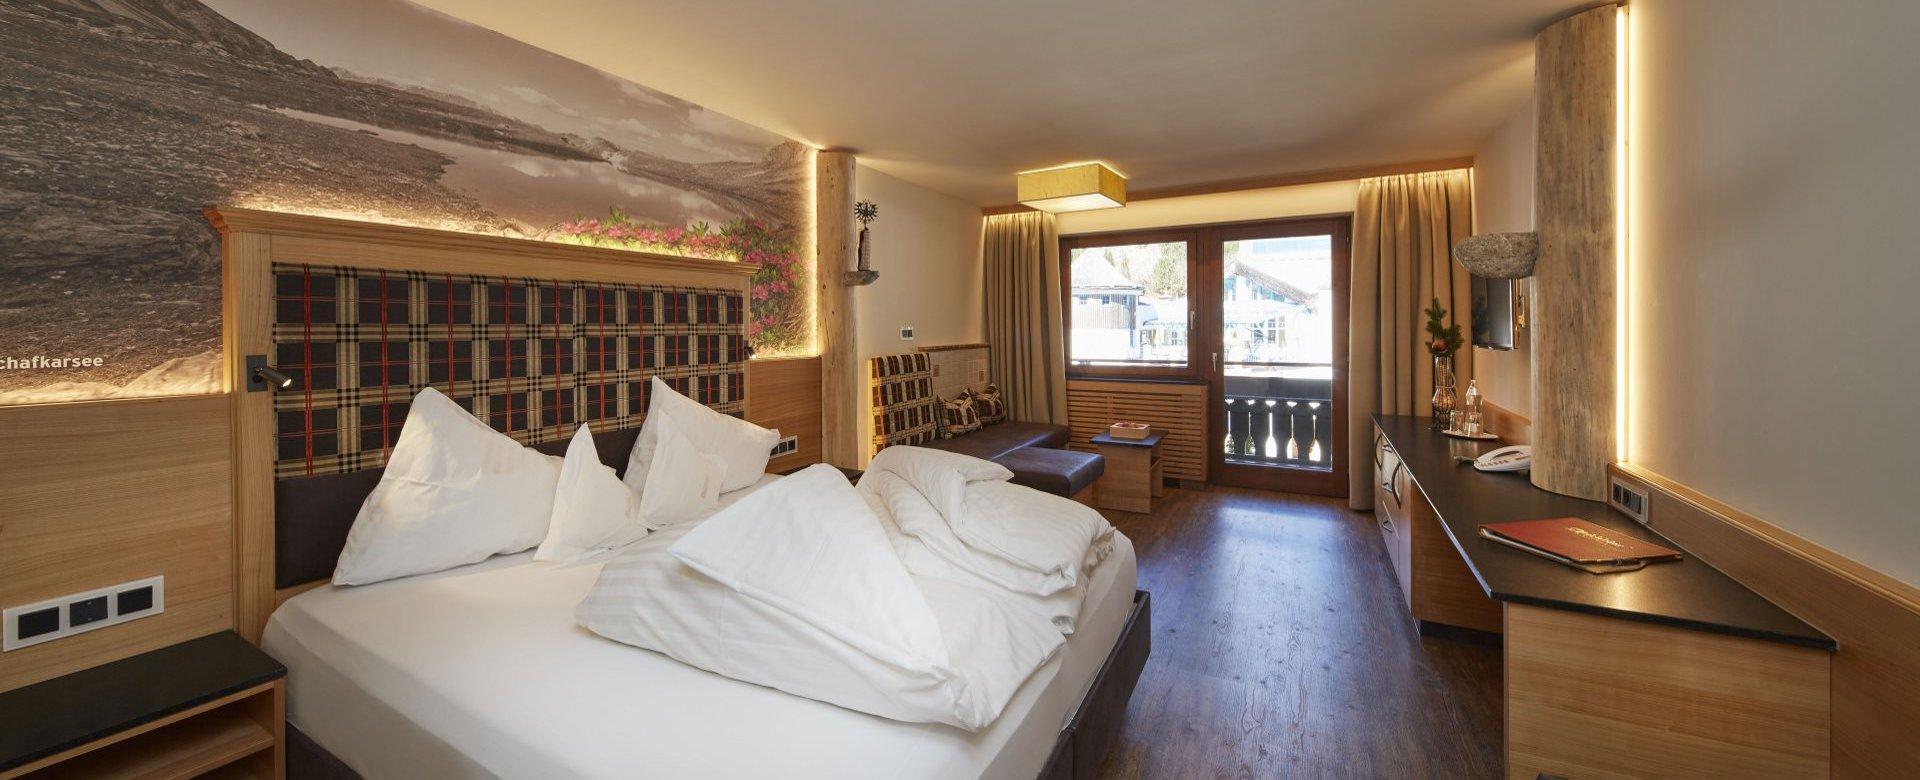 Wellnesshotel Alpenrose Lechtal Tirol